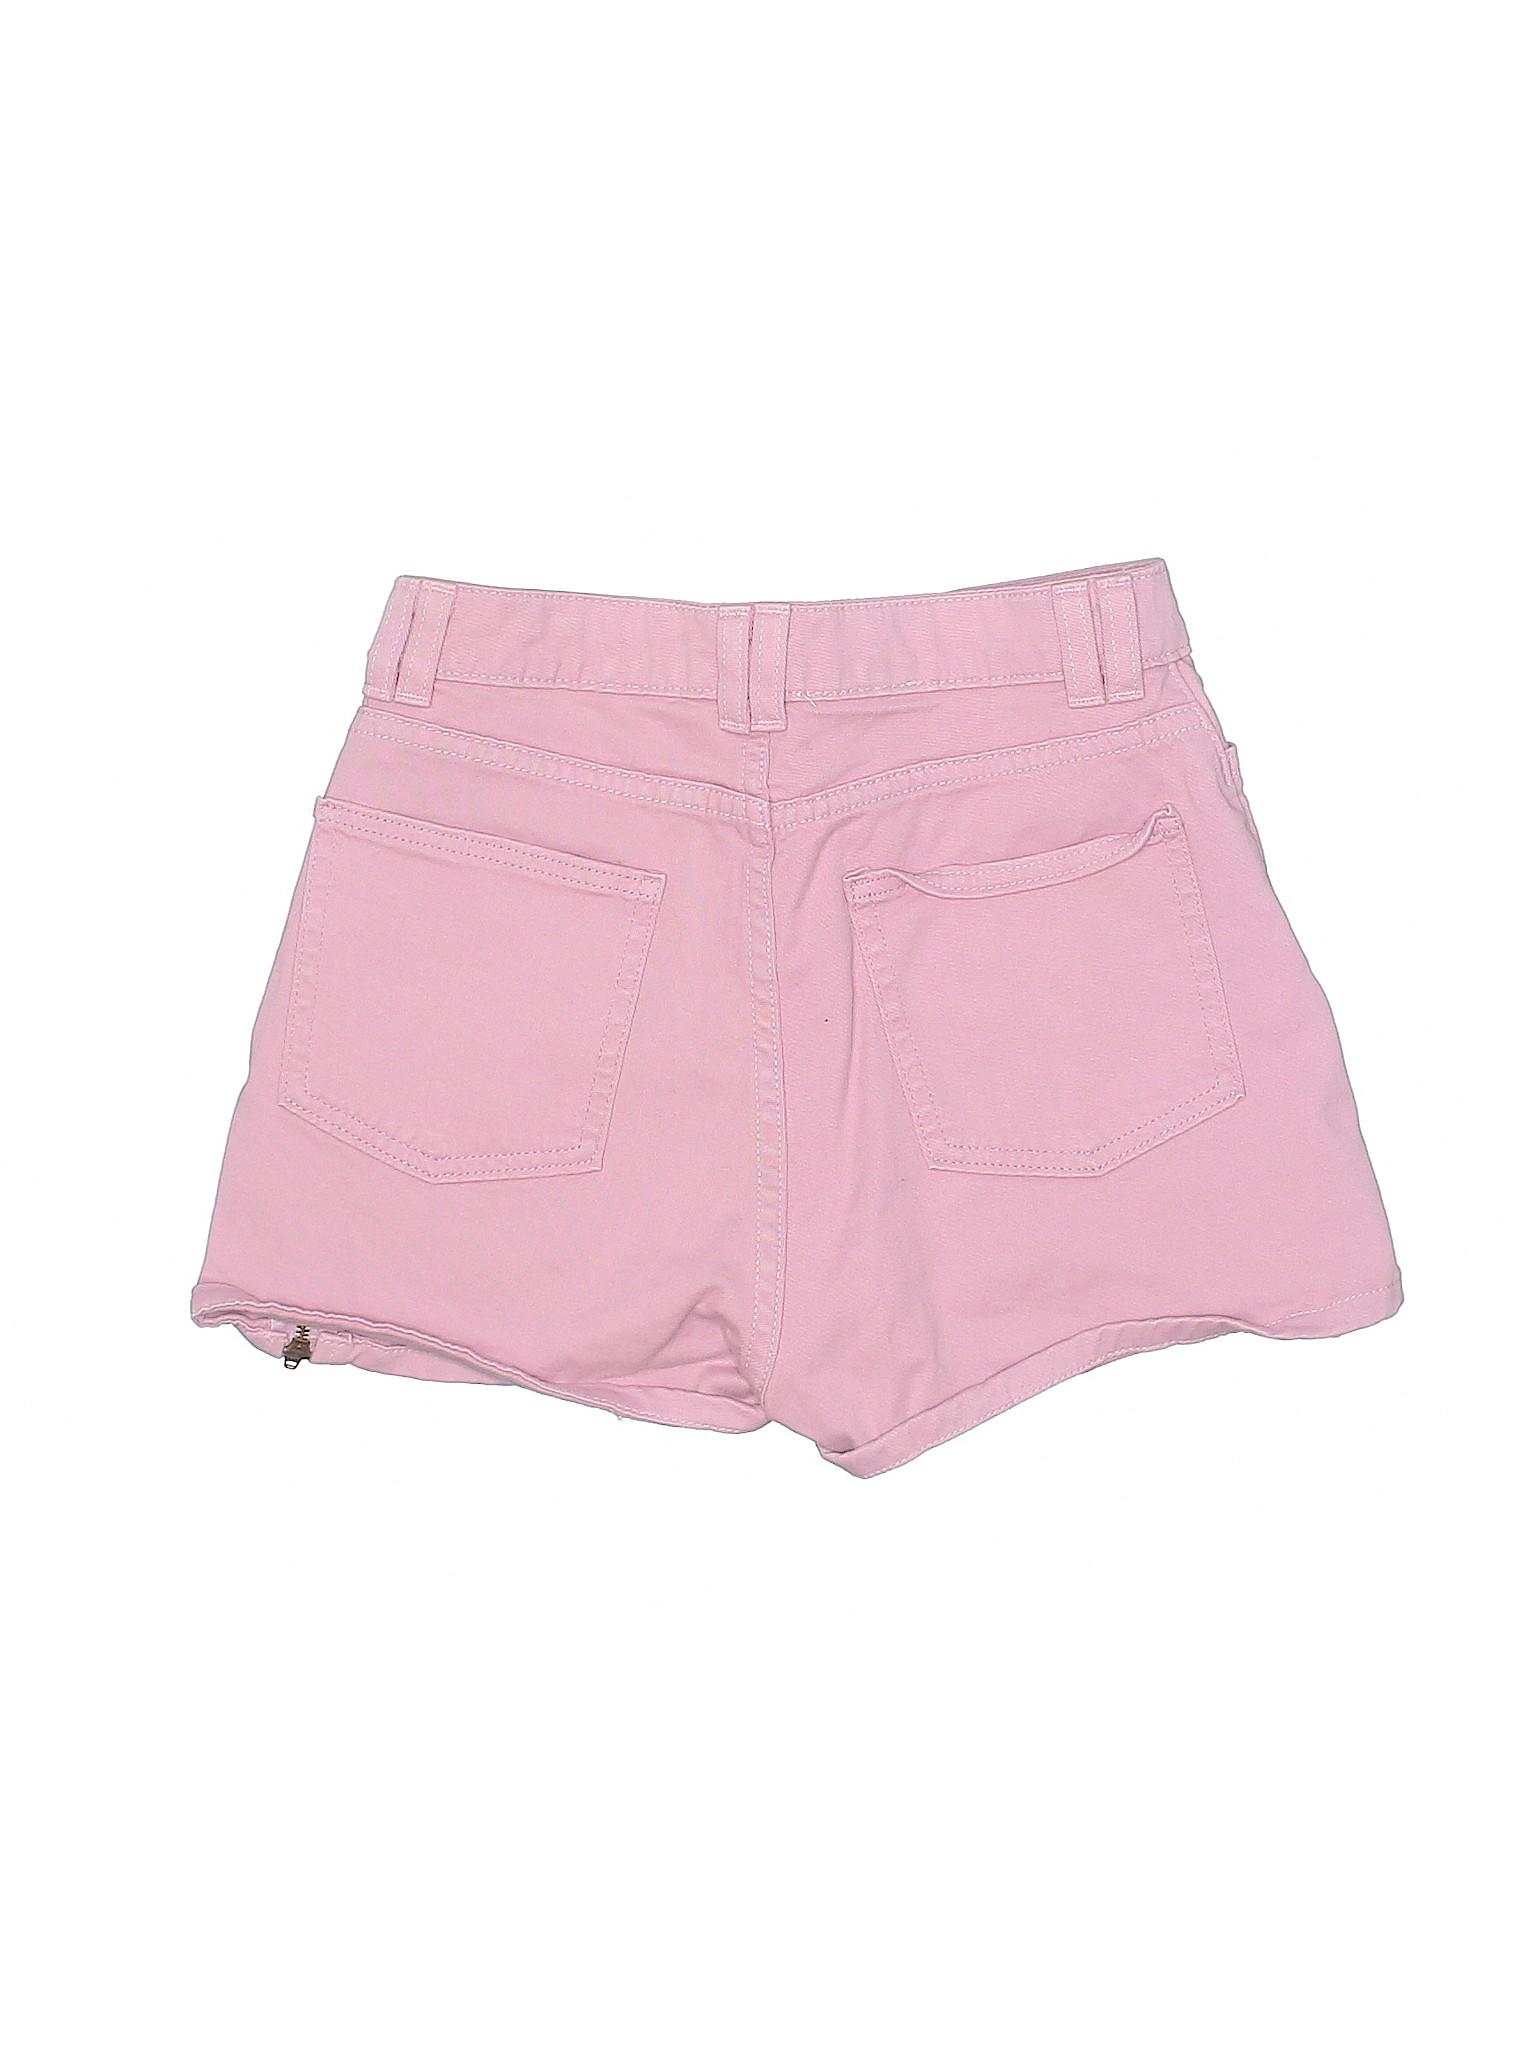 Boutique Apparel Denim Shorts American leisure rgwqOr